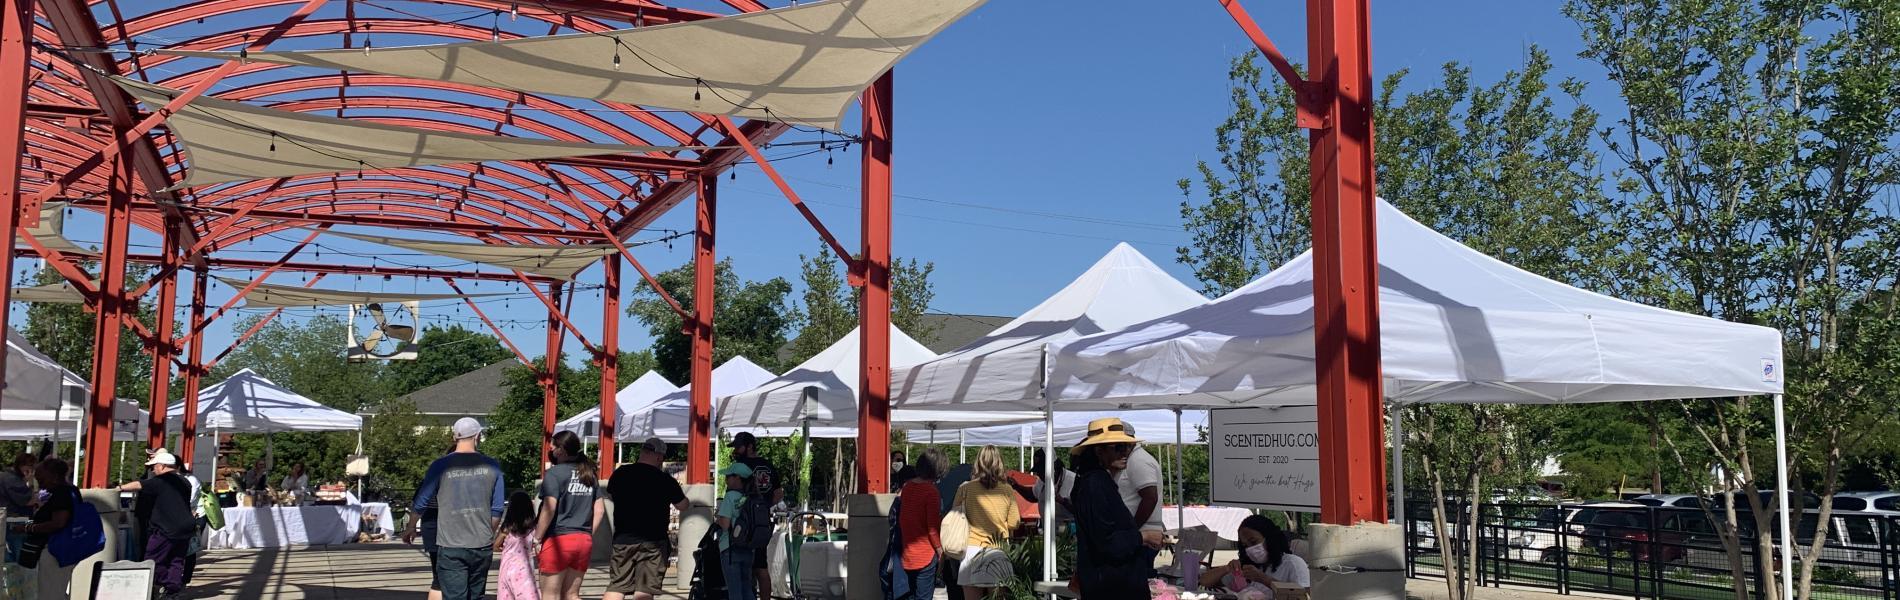 The City Center Farmers Market